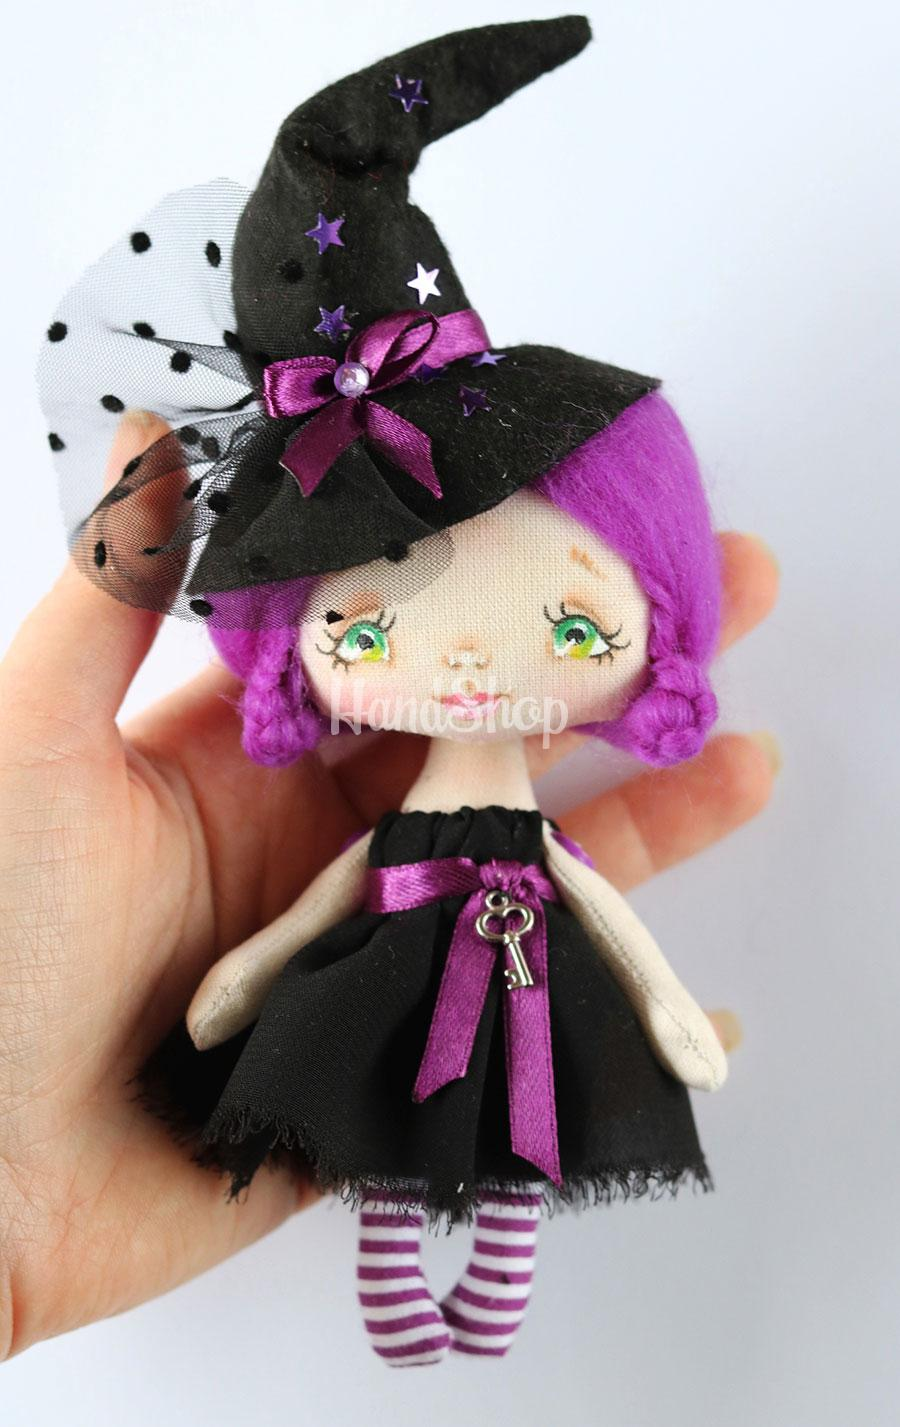 Маленькая кукла ведьма на хэллоуин